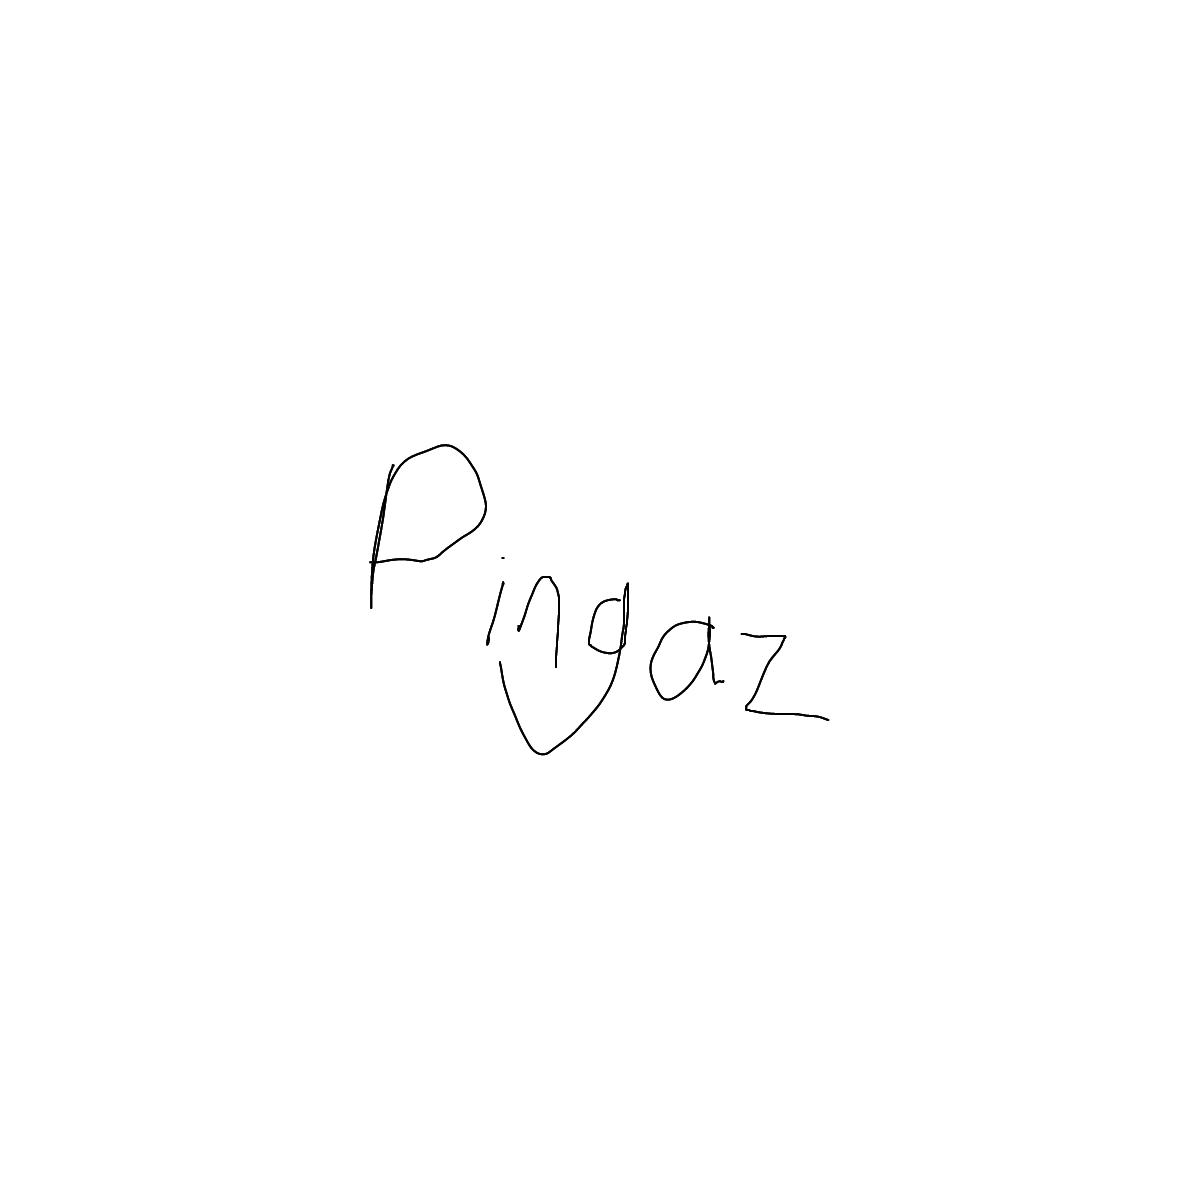 BAAAM drawing#7242 lat:-28.0000762939453120lng: 153.4277648925781200